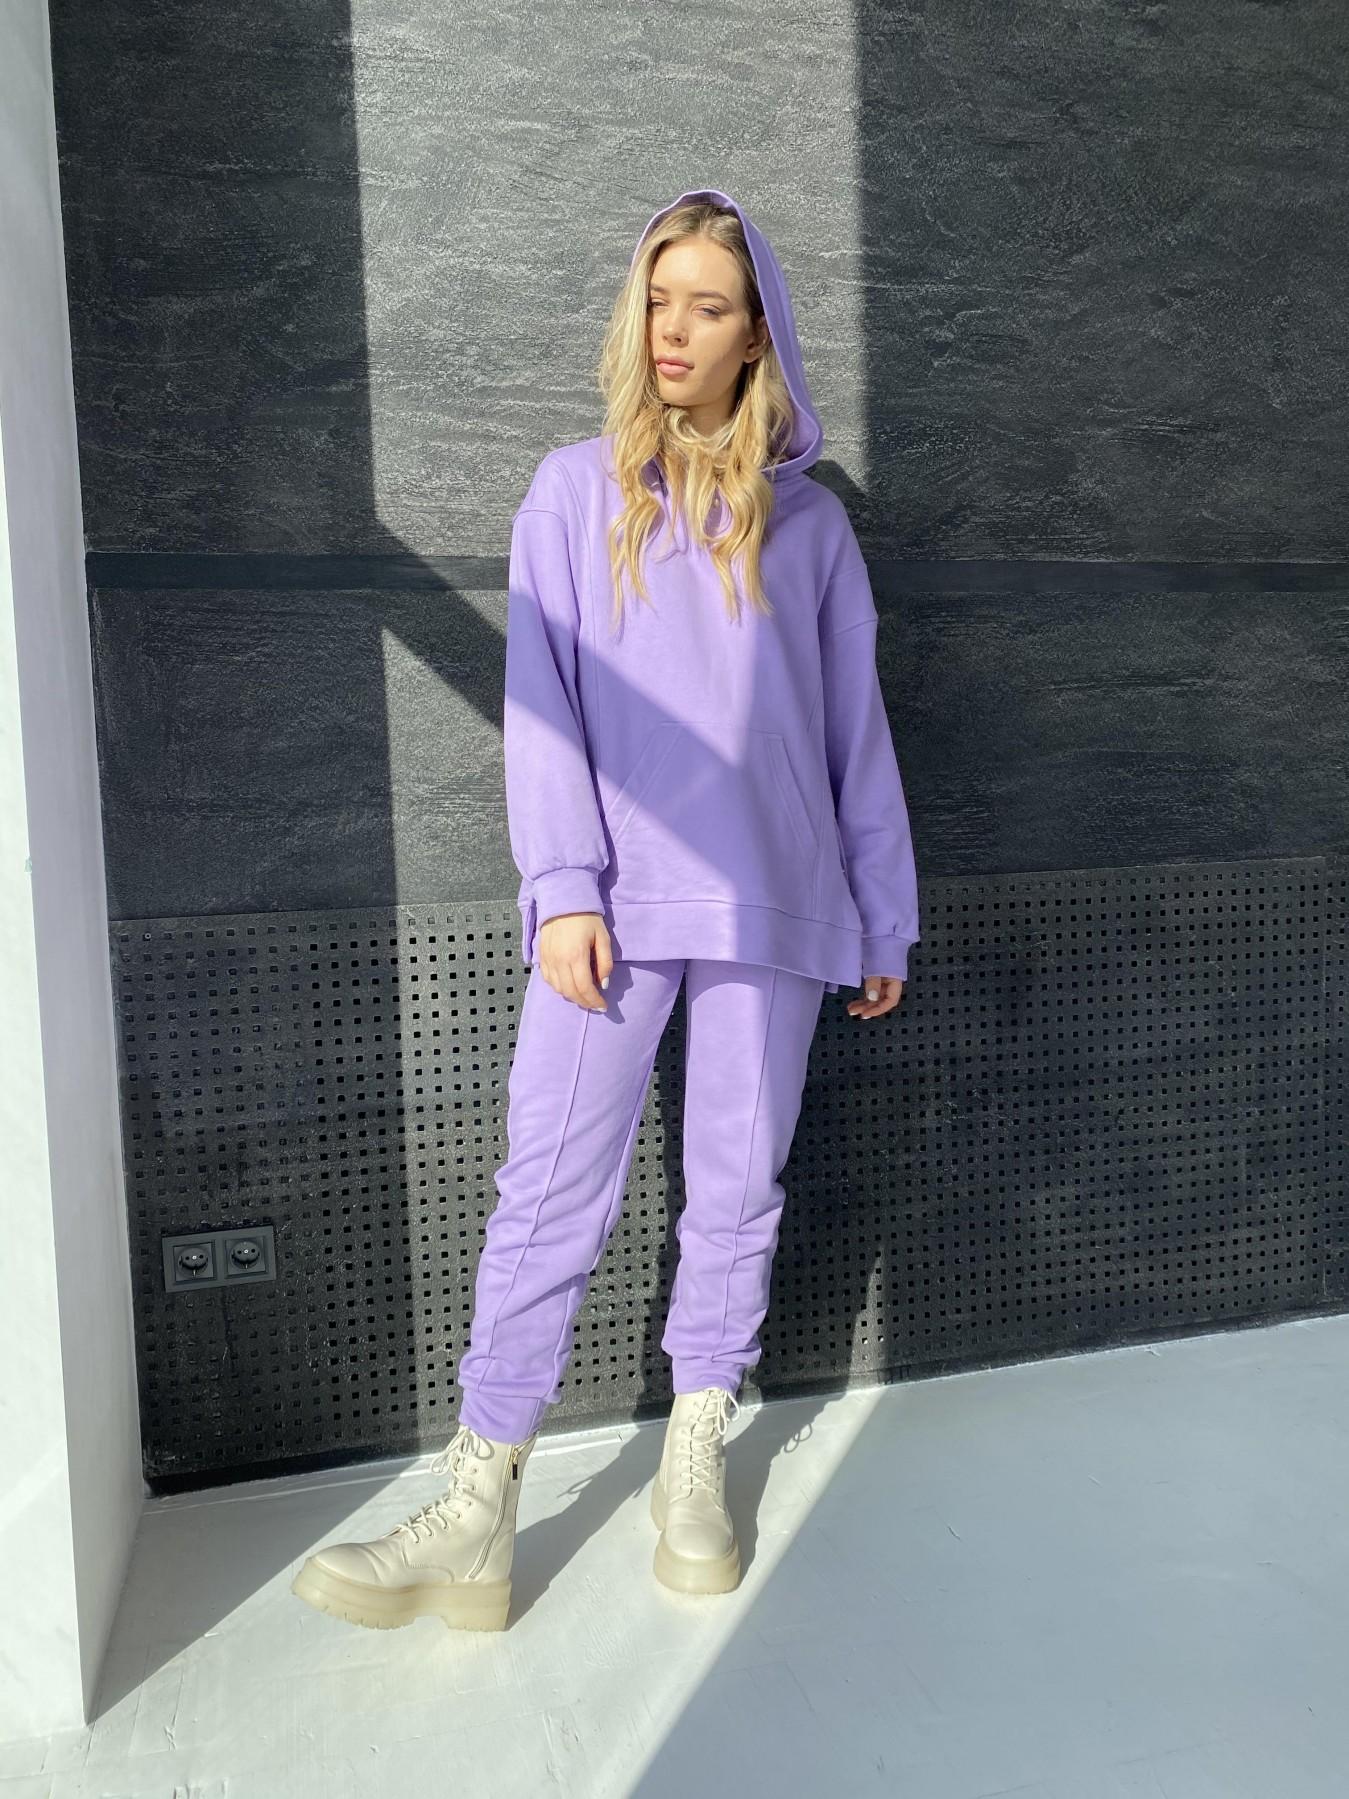 Лайф костюм  из 3х нитки 10782 АРТ. 47258 Цвет: Лаванда - фото 4, интернет магазин tm-modus.ru